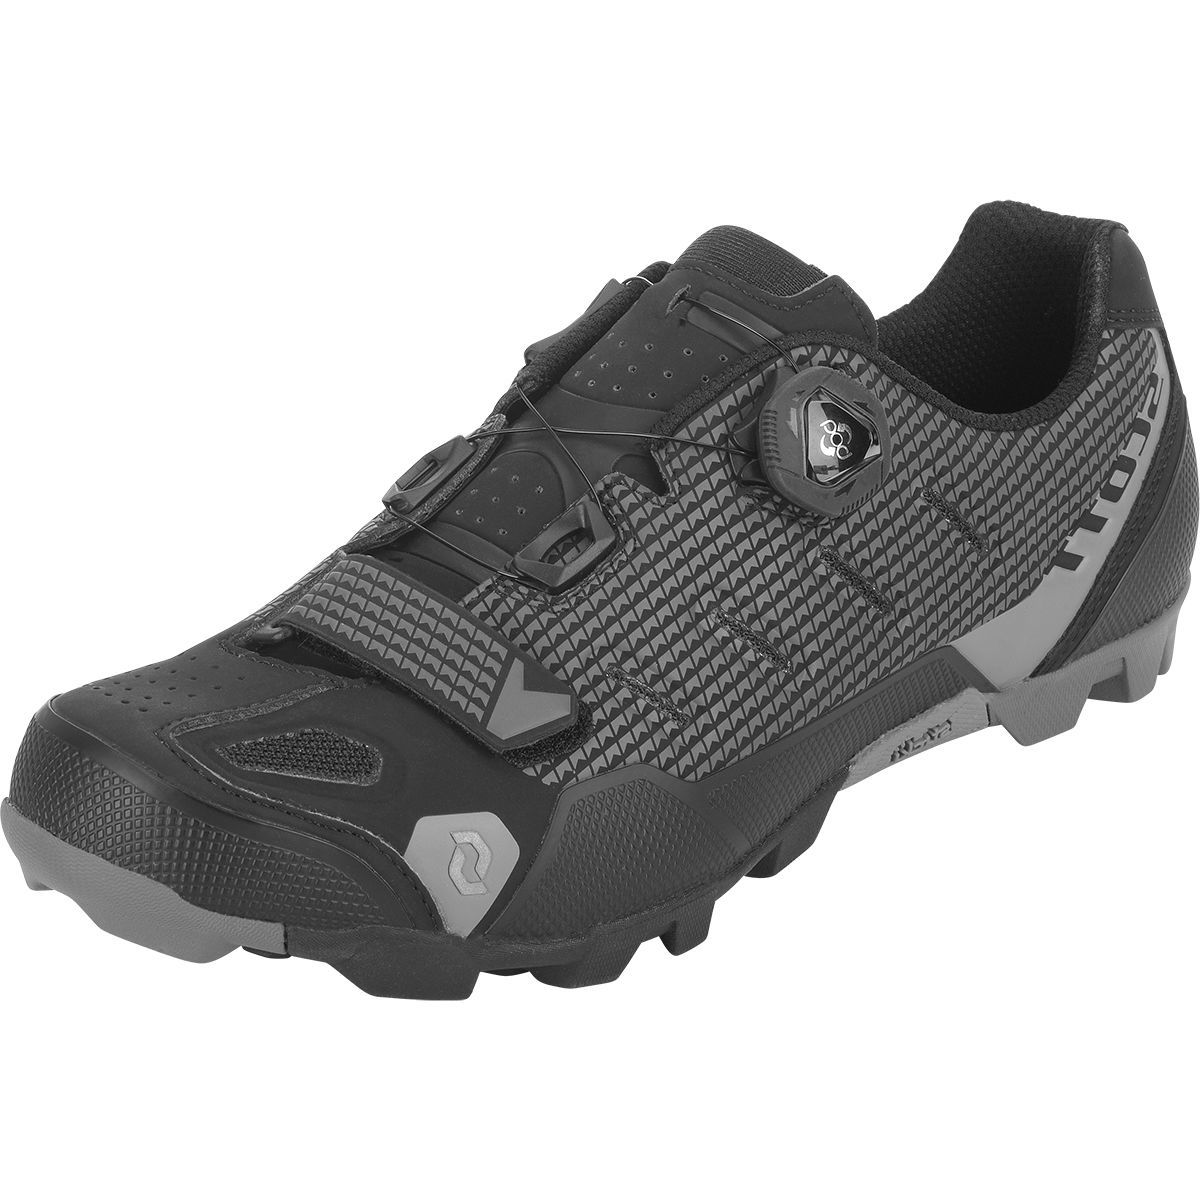 Scott MTB Prowl-R RS Cycling Shoe - Men's